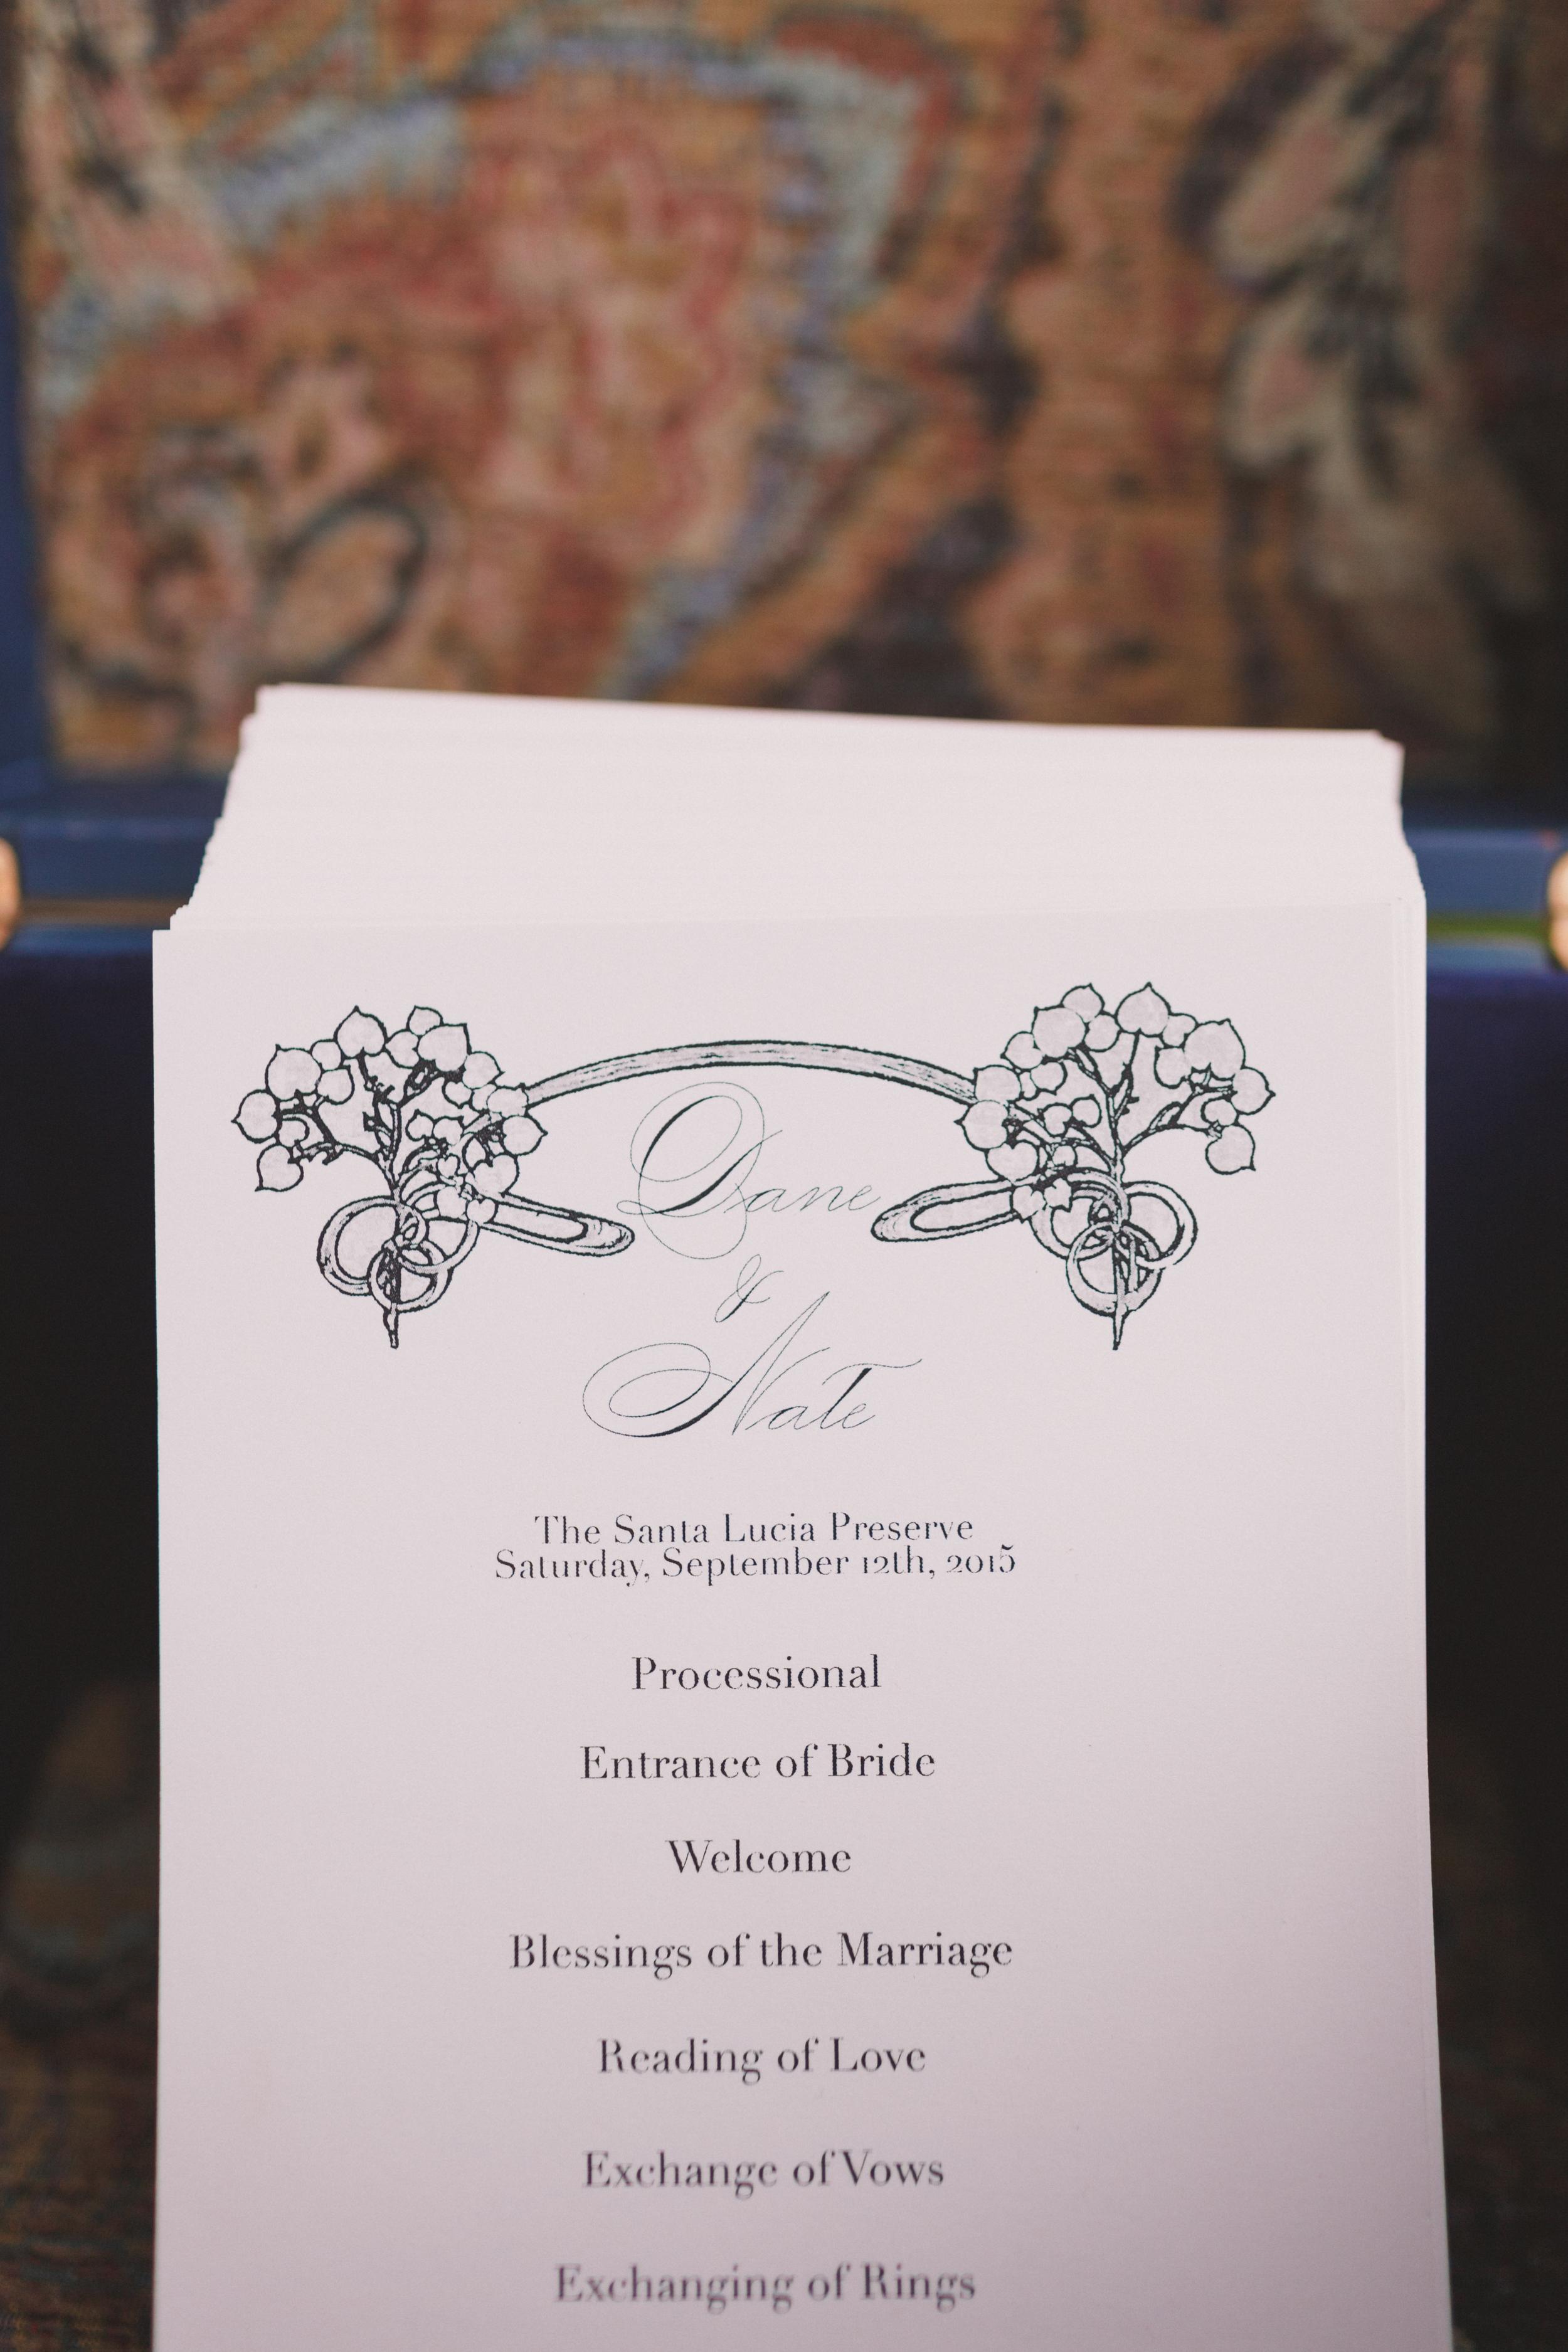 JENNIFER-SKOG-dane-nate-santa-lucia-preserve-wedding-0473.jpg